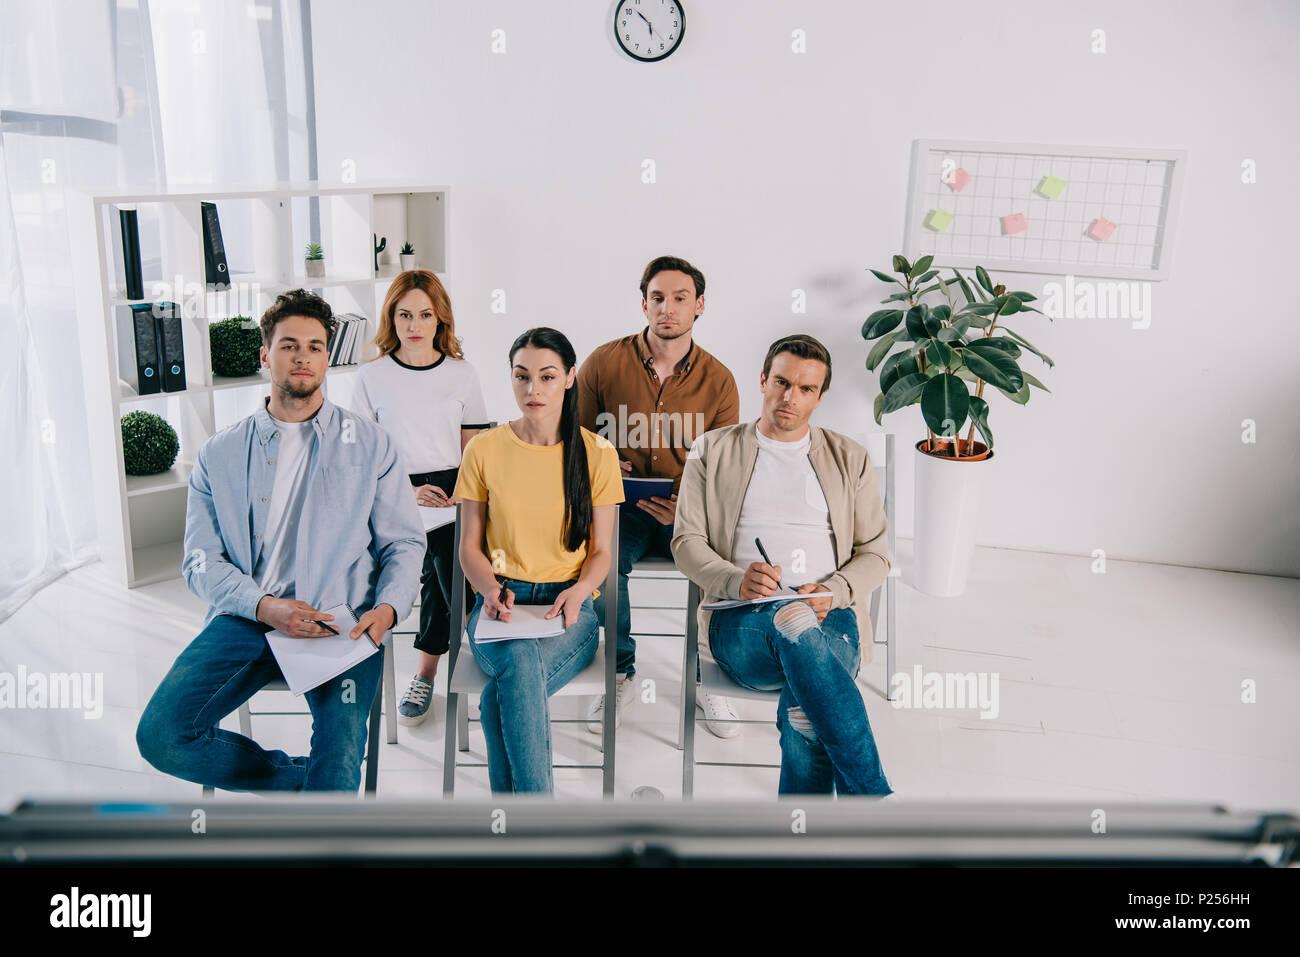 Grupo de hombres de negocios de ropa informal con portátiles con formación empresarial en Office Imagen De Stock